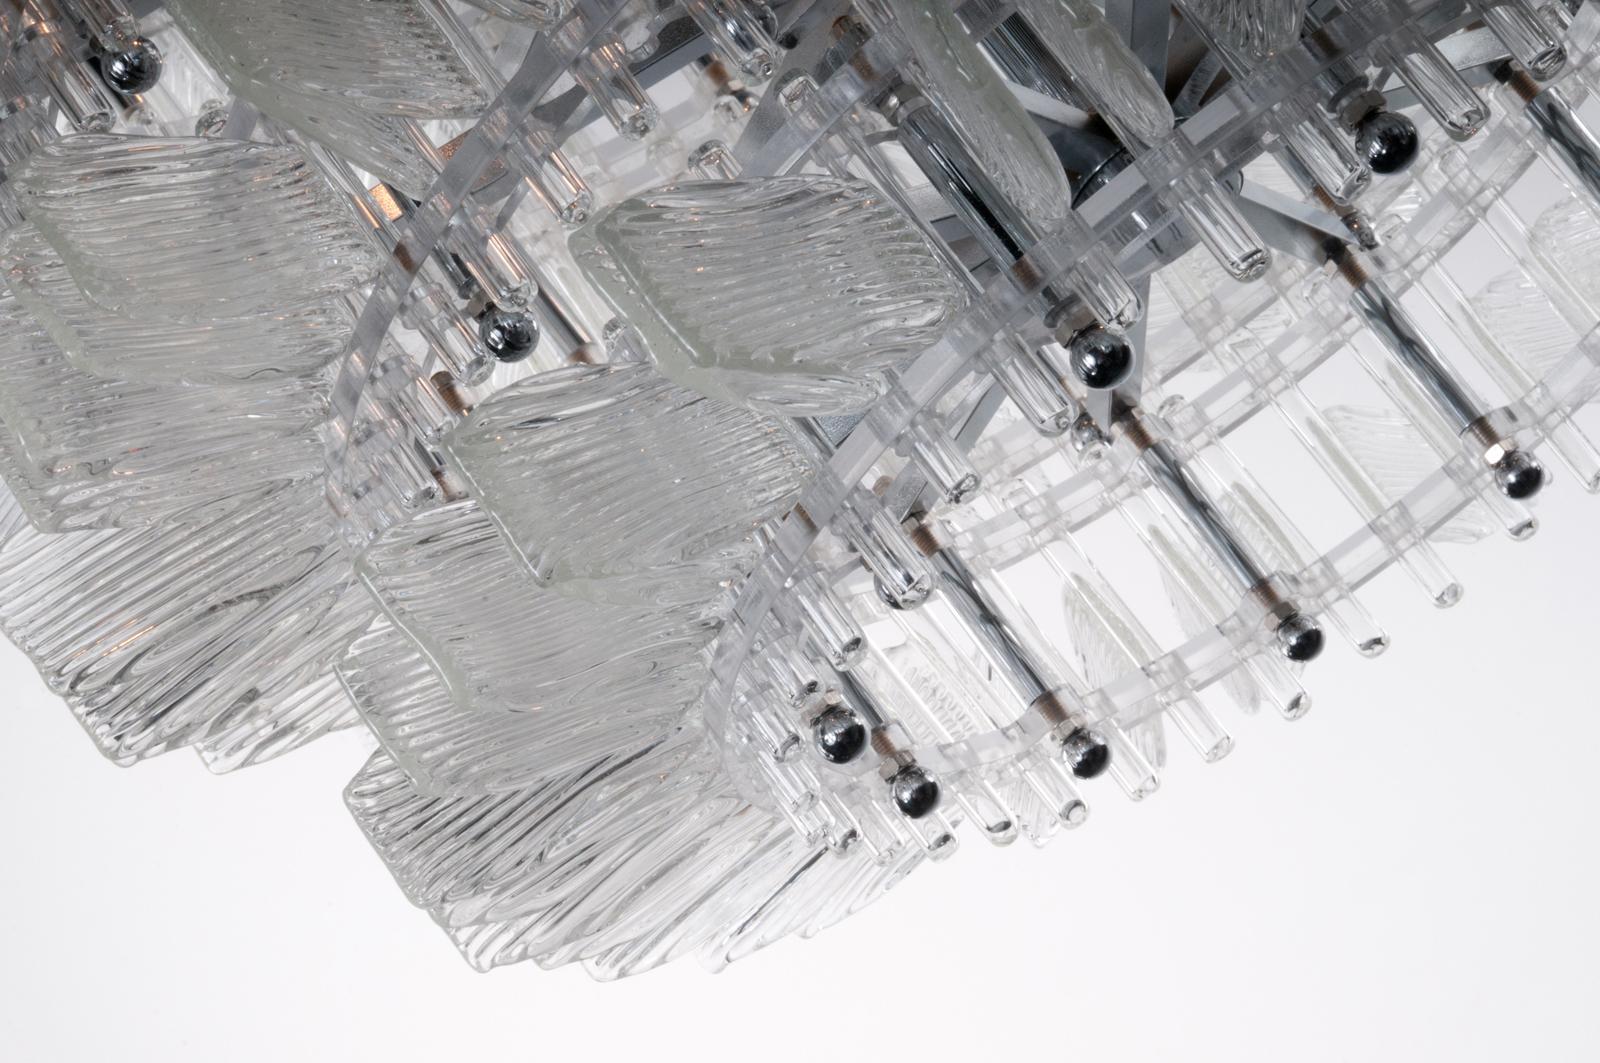 anemone-plafonnier-ceiling-veronese-tal-lancman-maurizio-galante-121.jpg